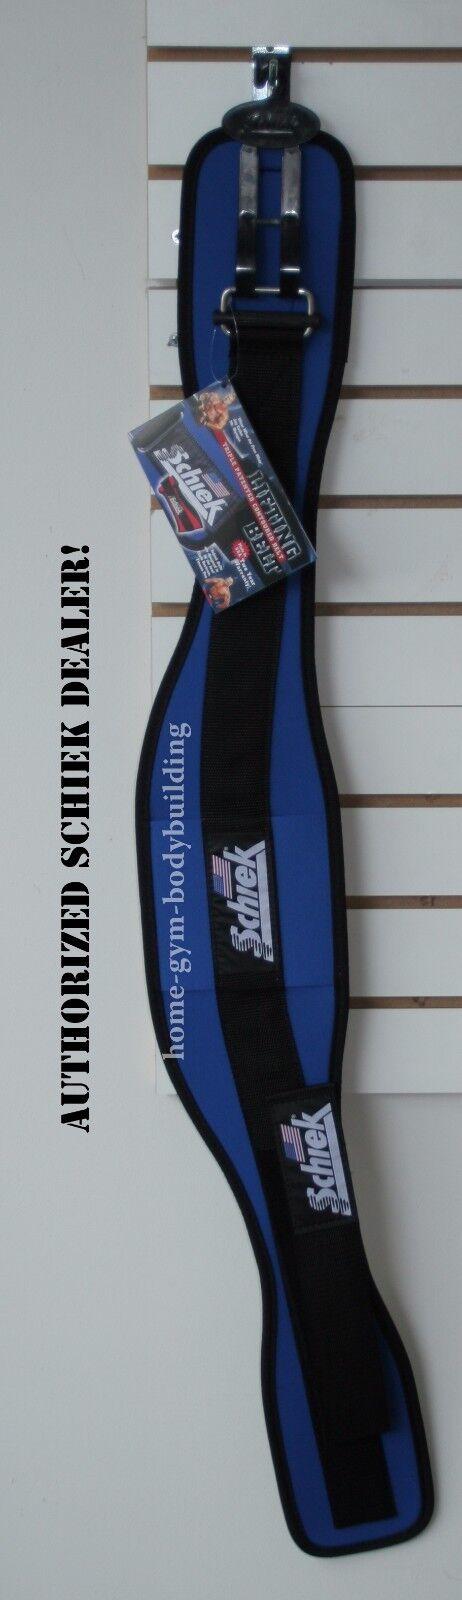 Weight Blau Lifting Belt Schiek 2006 Nylon Royal Blau Weight Weightlifting Bodybuilding 2c24a1